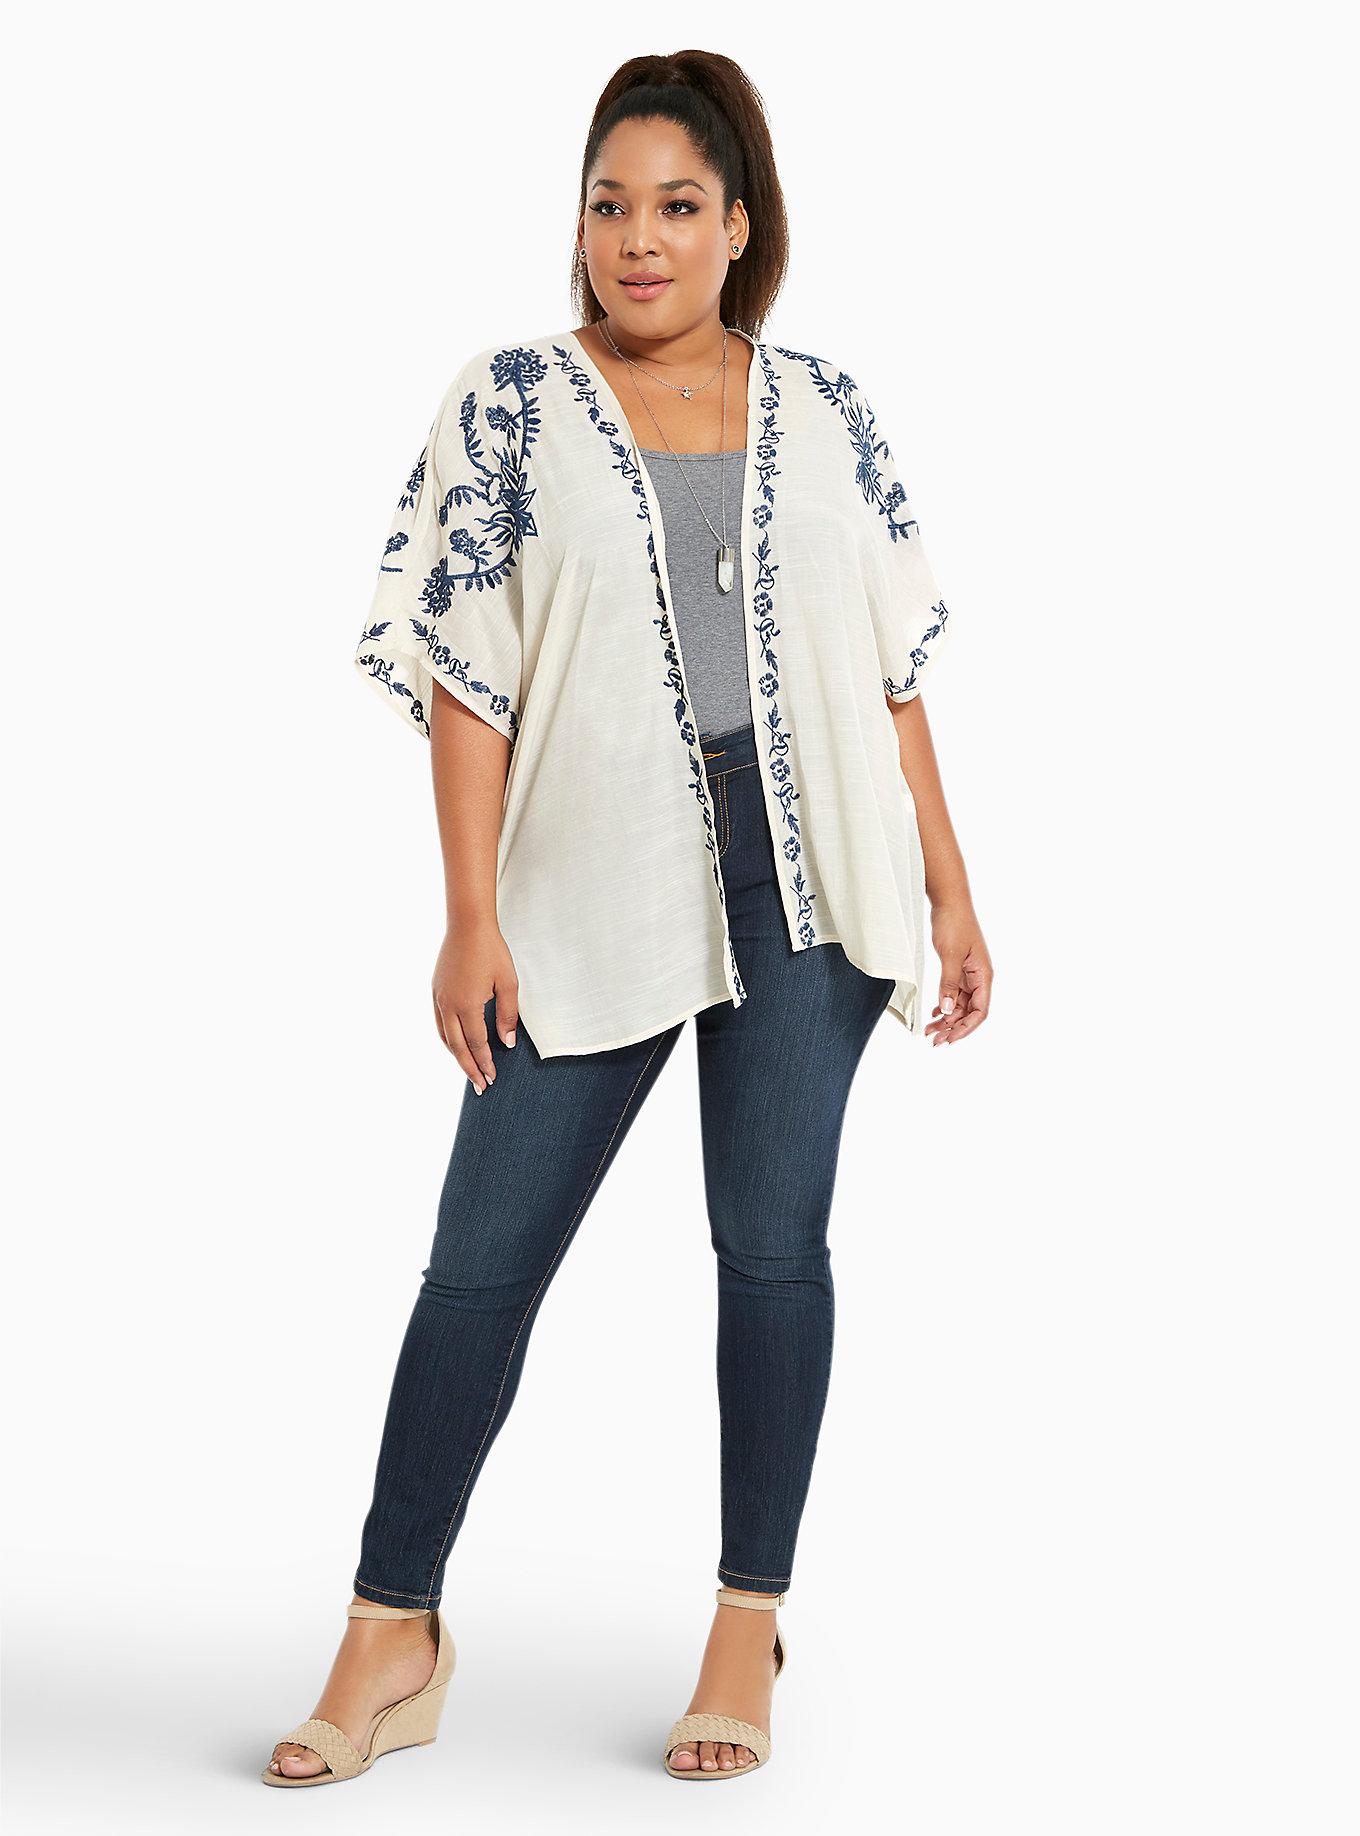 15 Plus Size Kimono Jackets For Light Summer Layering — PHOTOS